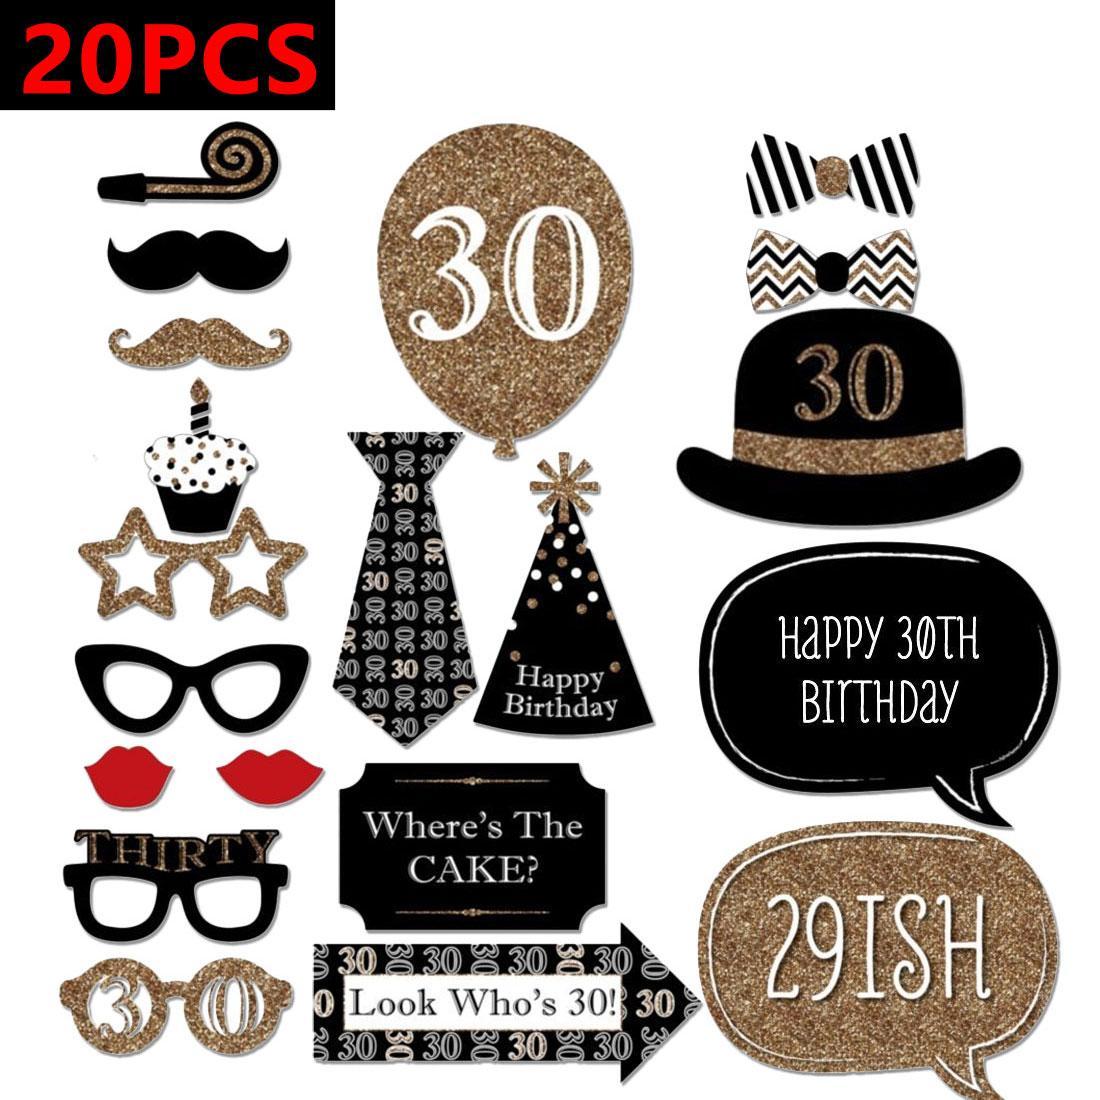 Grosshandel 30 40 50 Alles Gute Zum Geburtstag Party Dekorationen